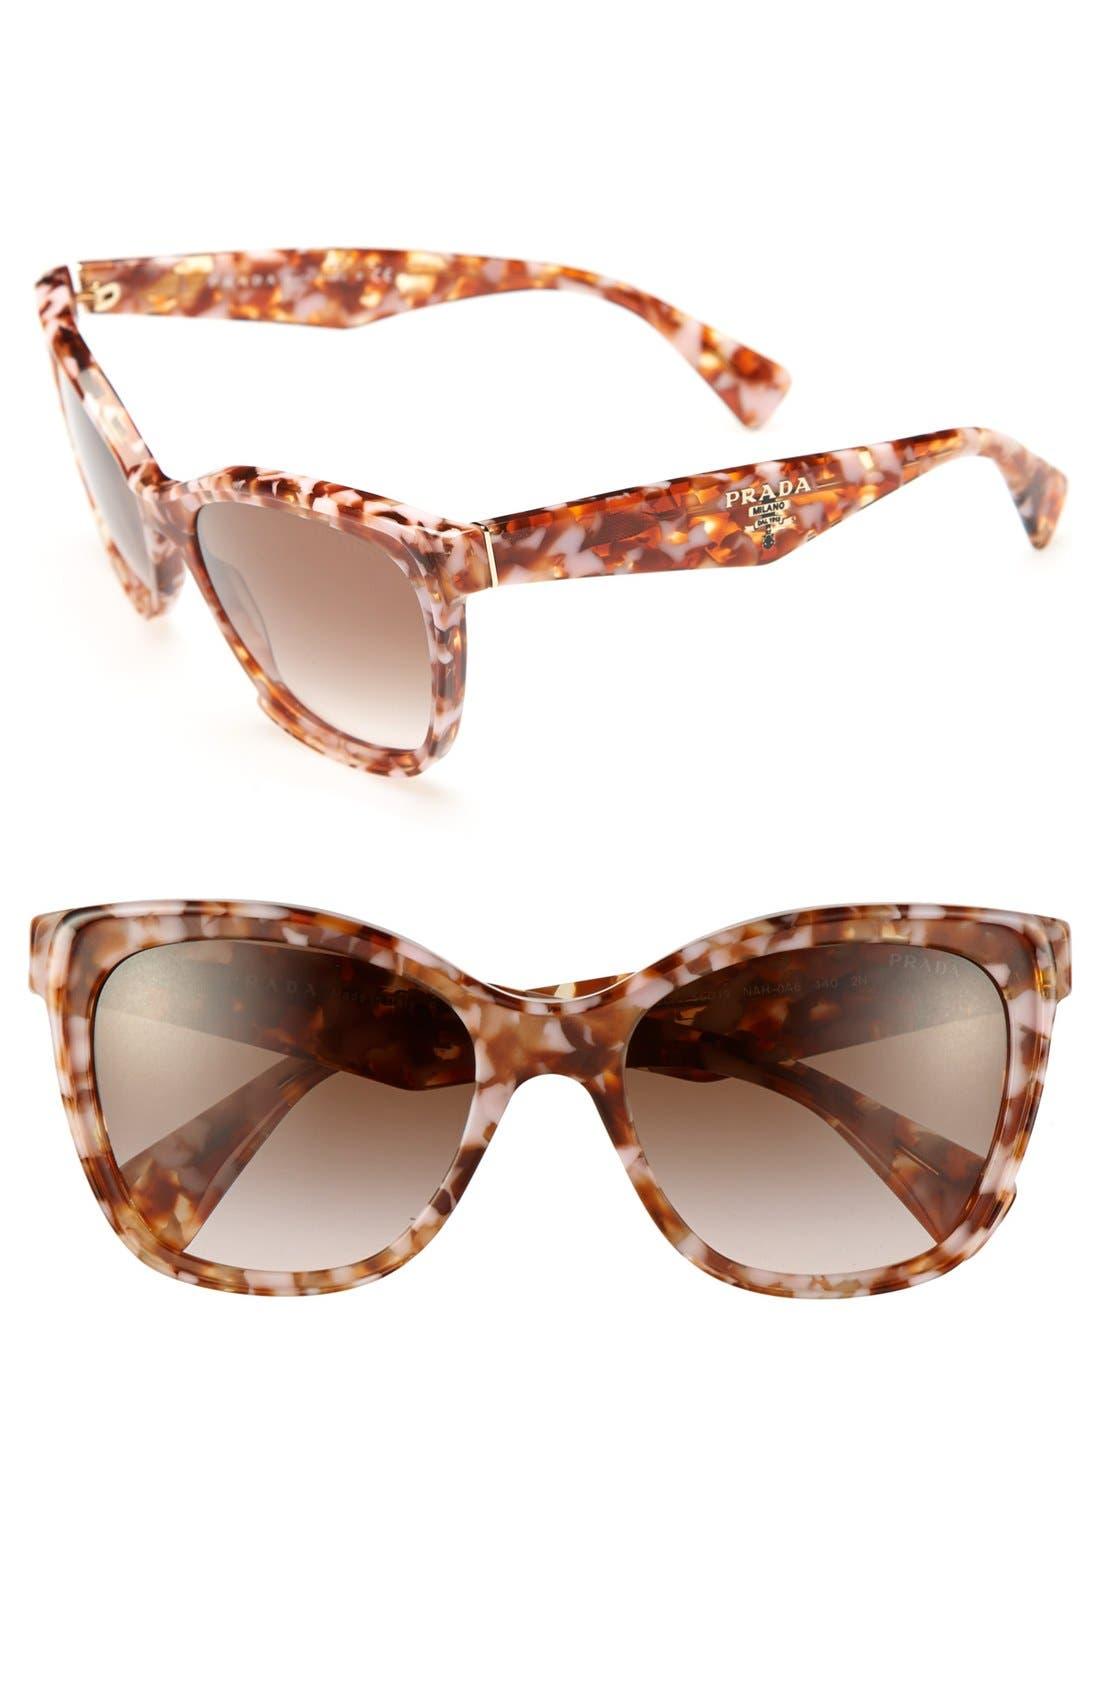 Main Image - Prada 56mm Oversized Retro Sunglasses